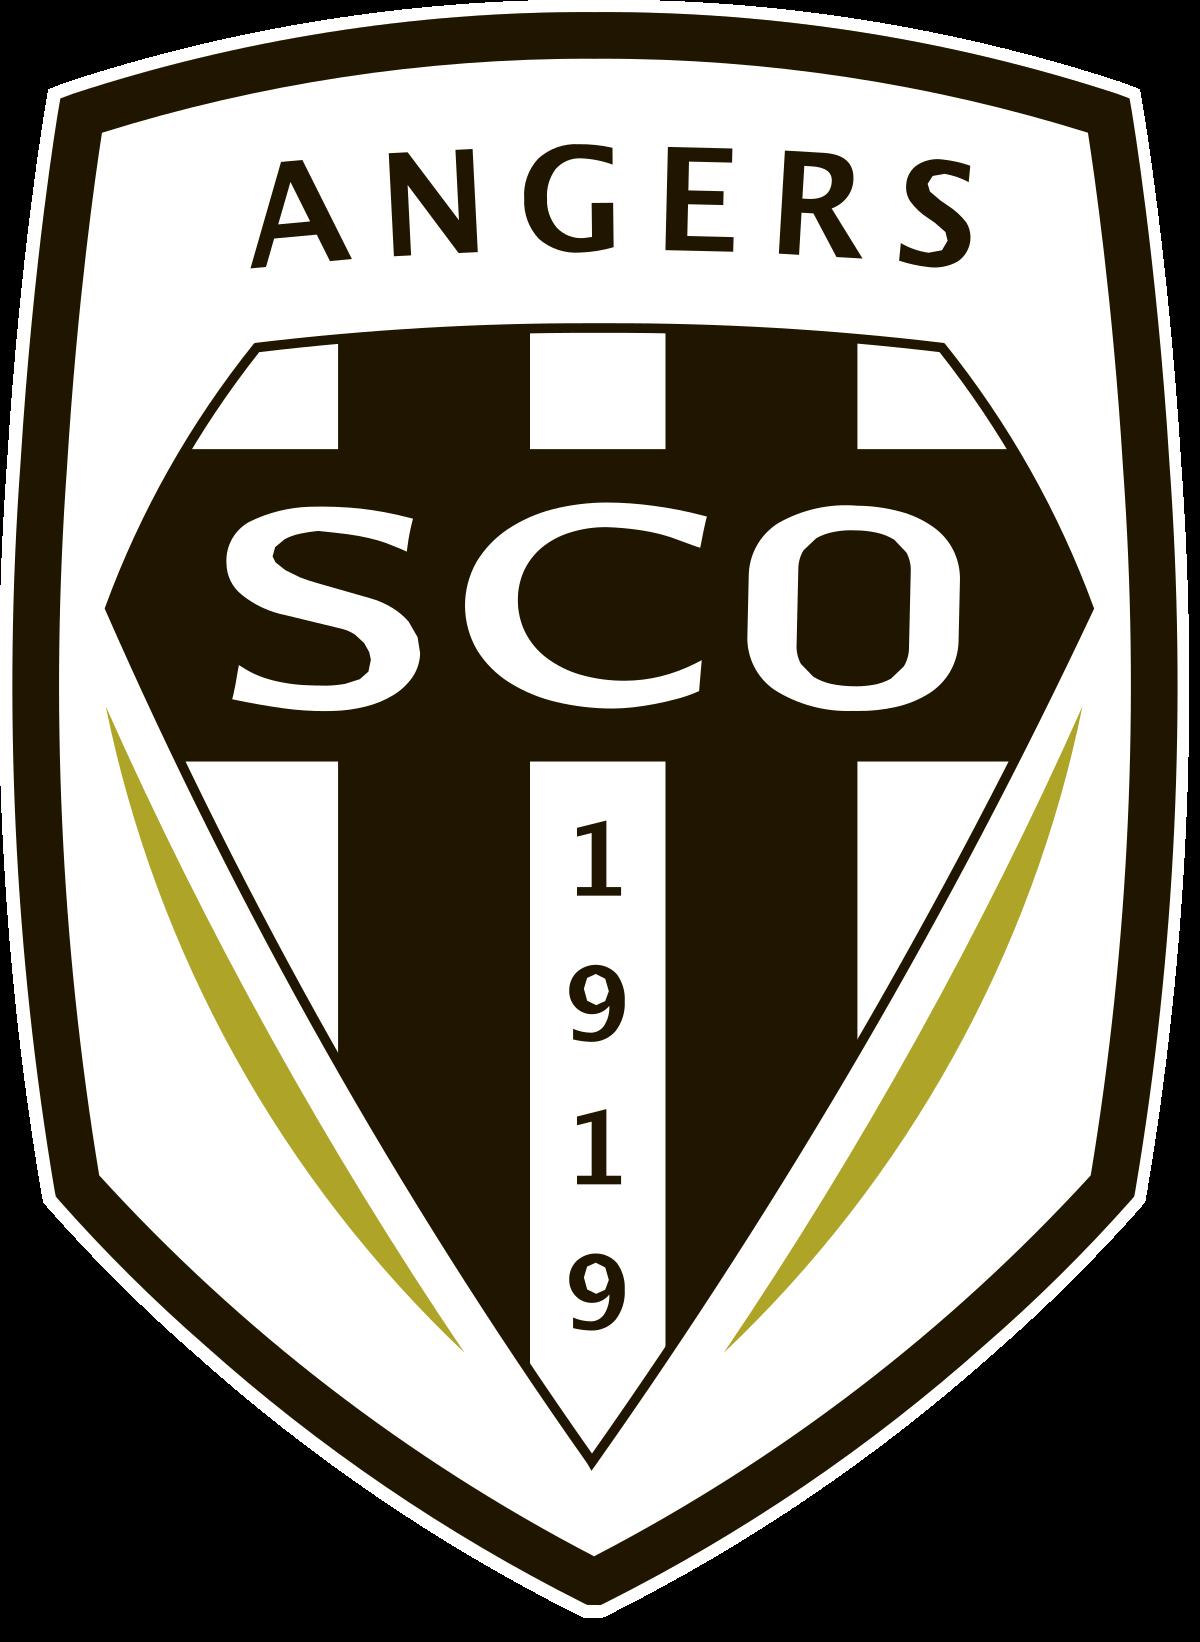 Angers-2 logo